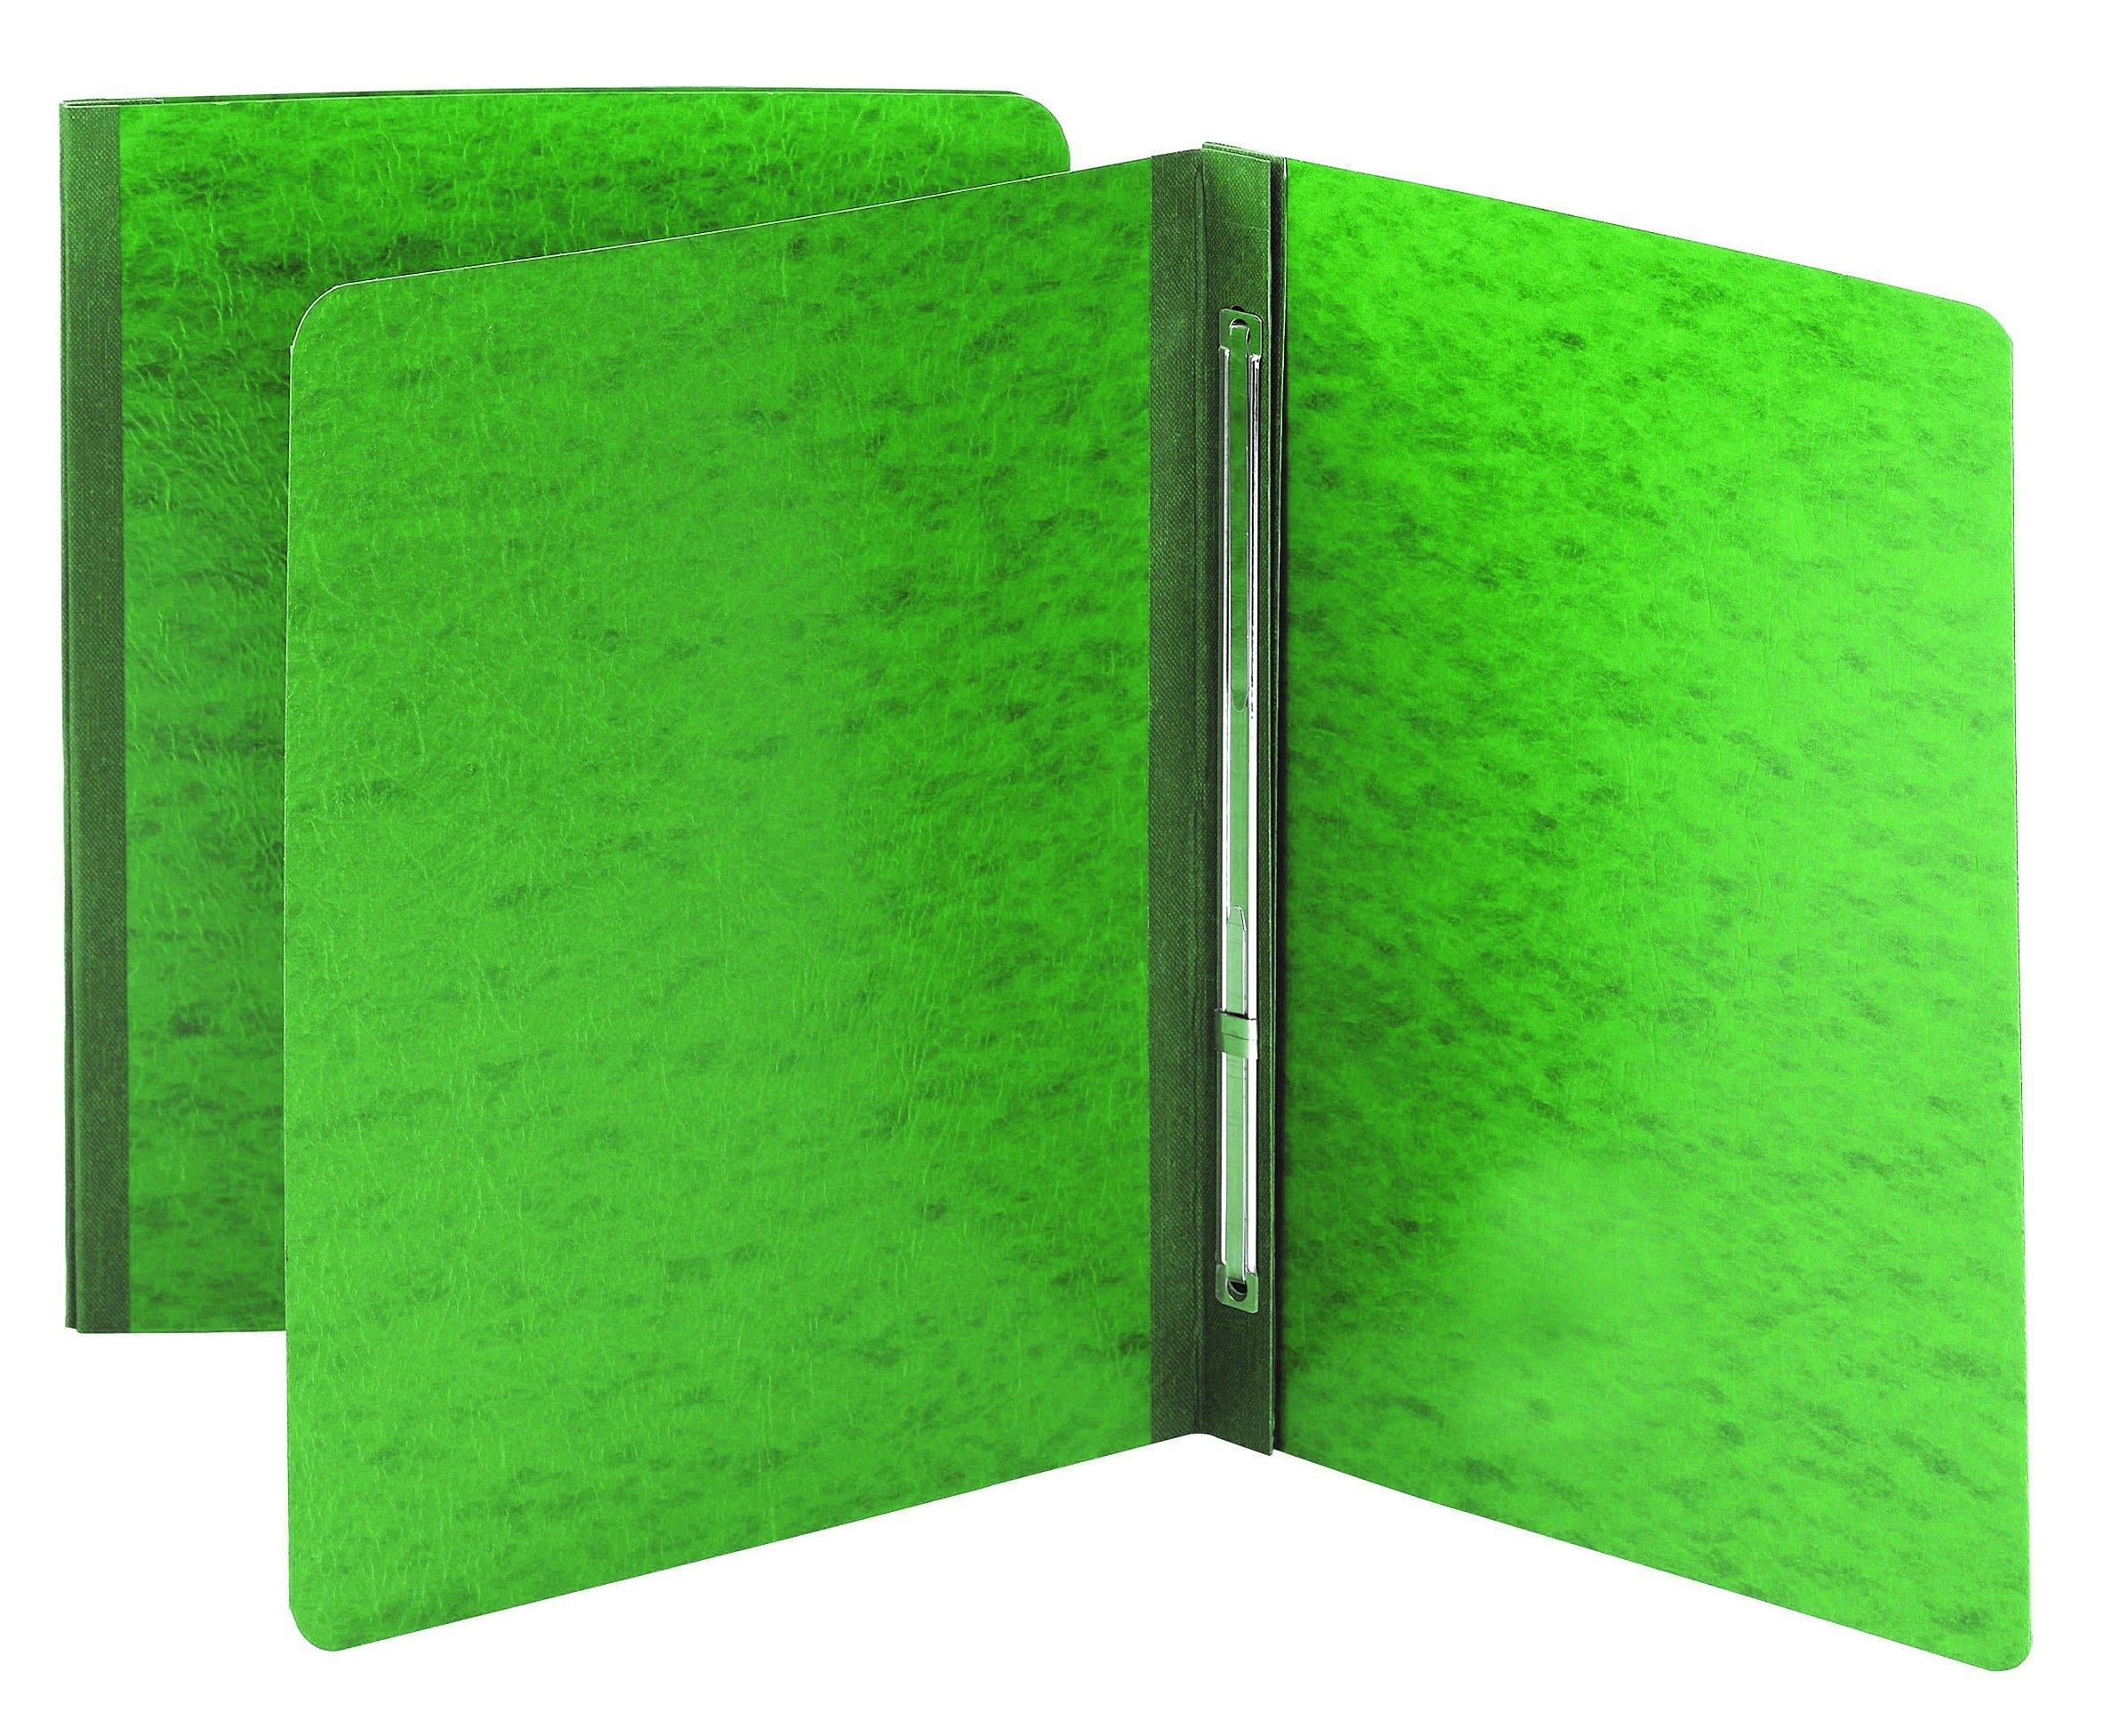 Smead PressGuard Report Cover with Side Fastener, 3'' Capacity, Letter Size, Green, 25 per box (81452)